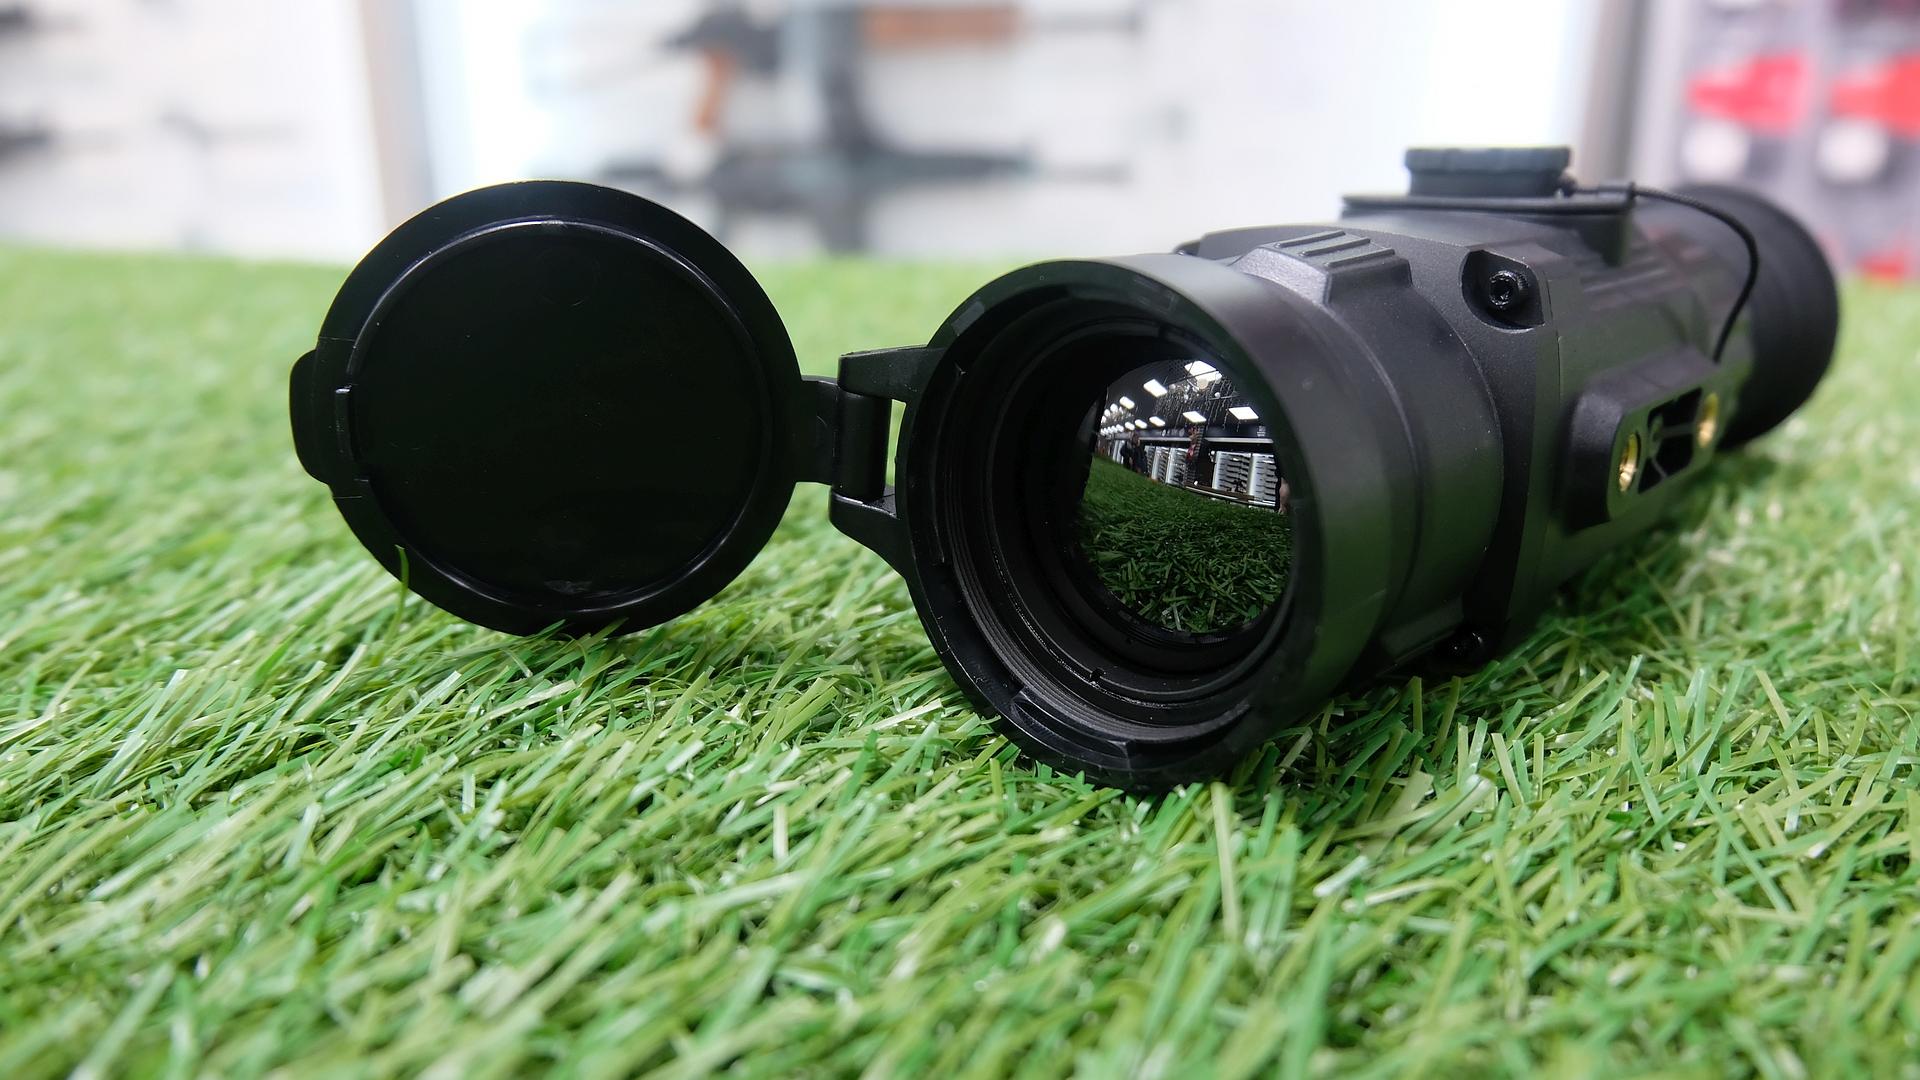 тепловизионный охотничий прицел iRay Aper TS35